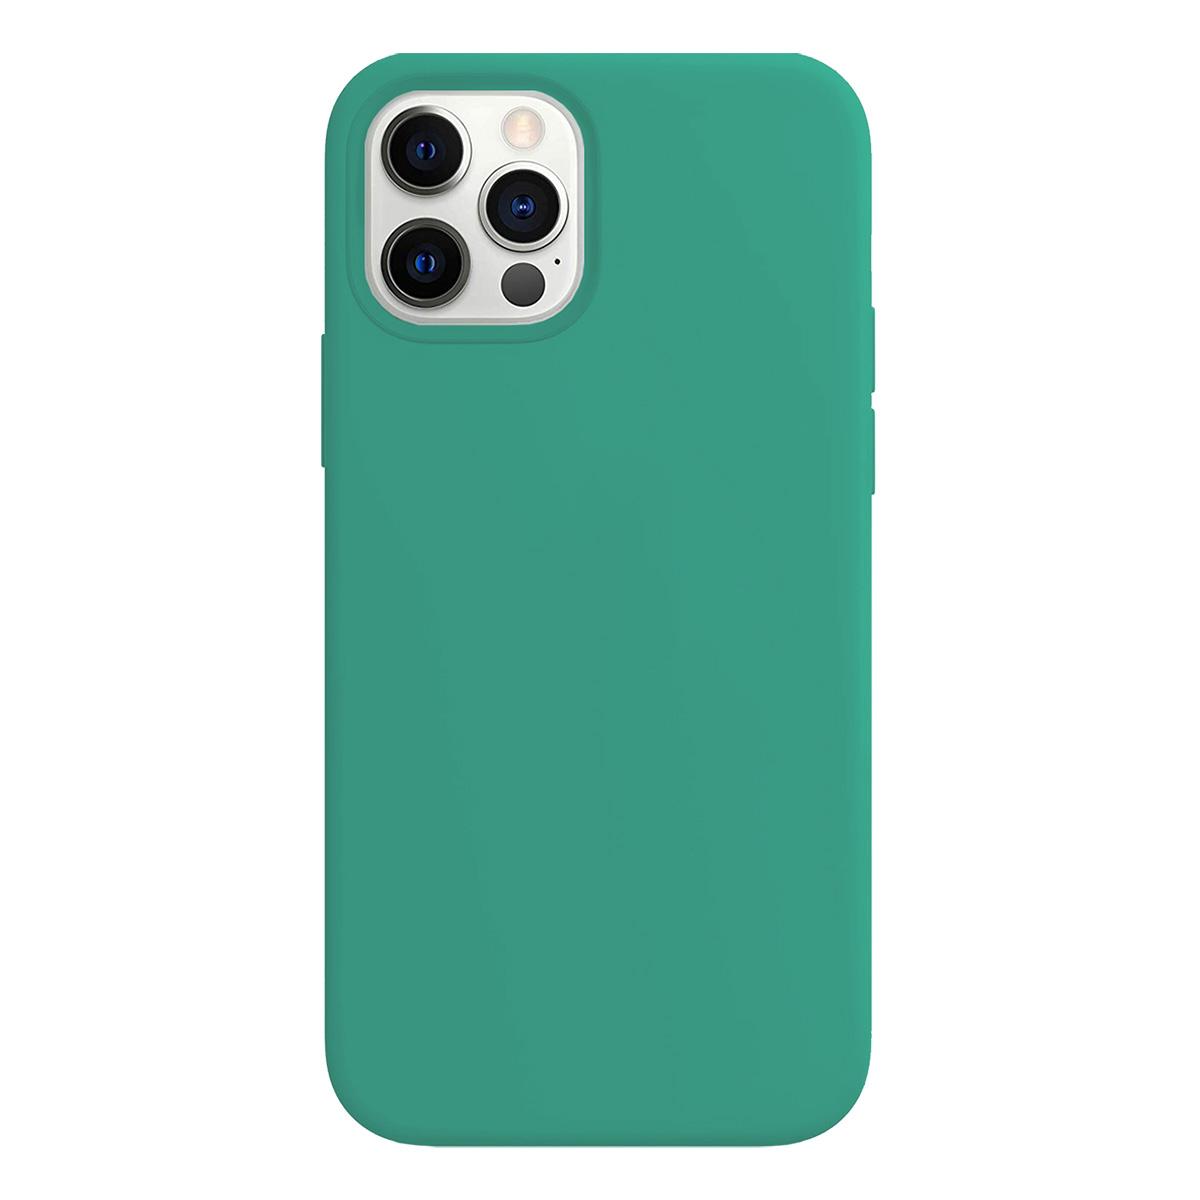 Buff iPhone 12 Pro Max Rubber S Kılıf Cornflower